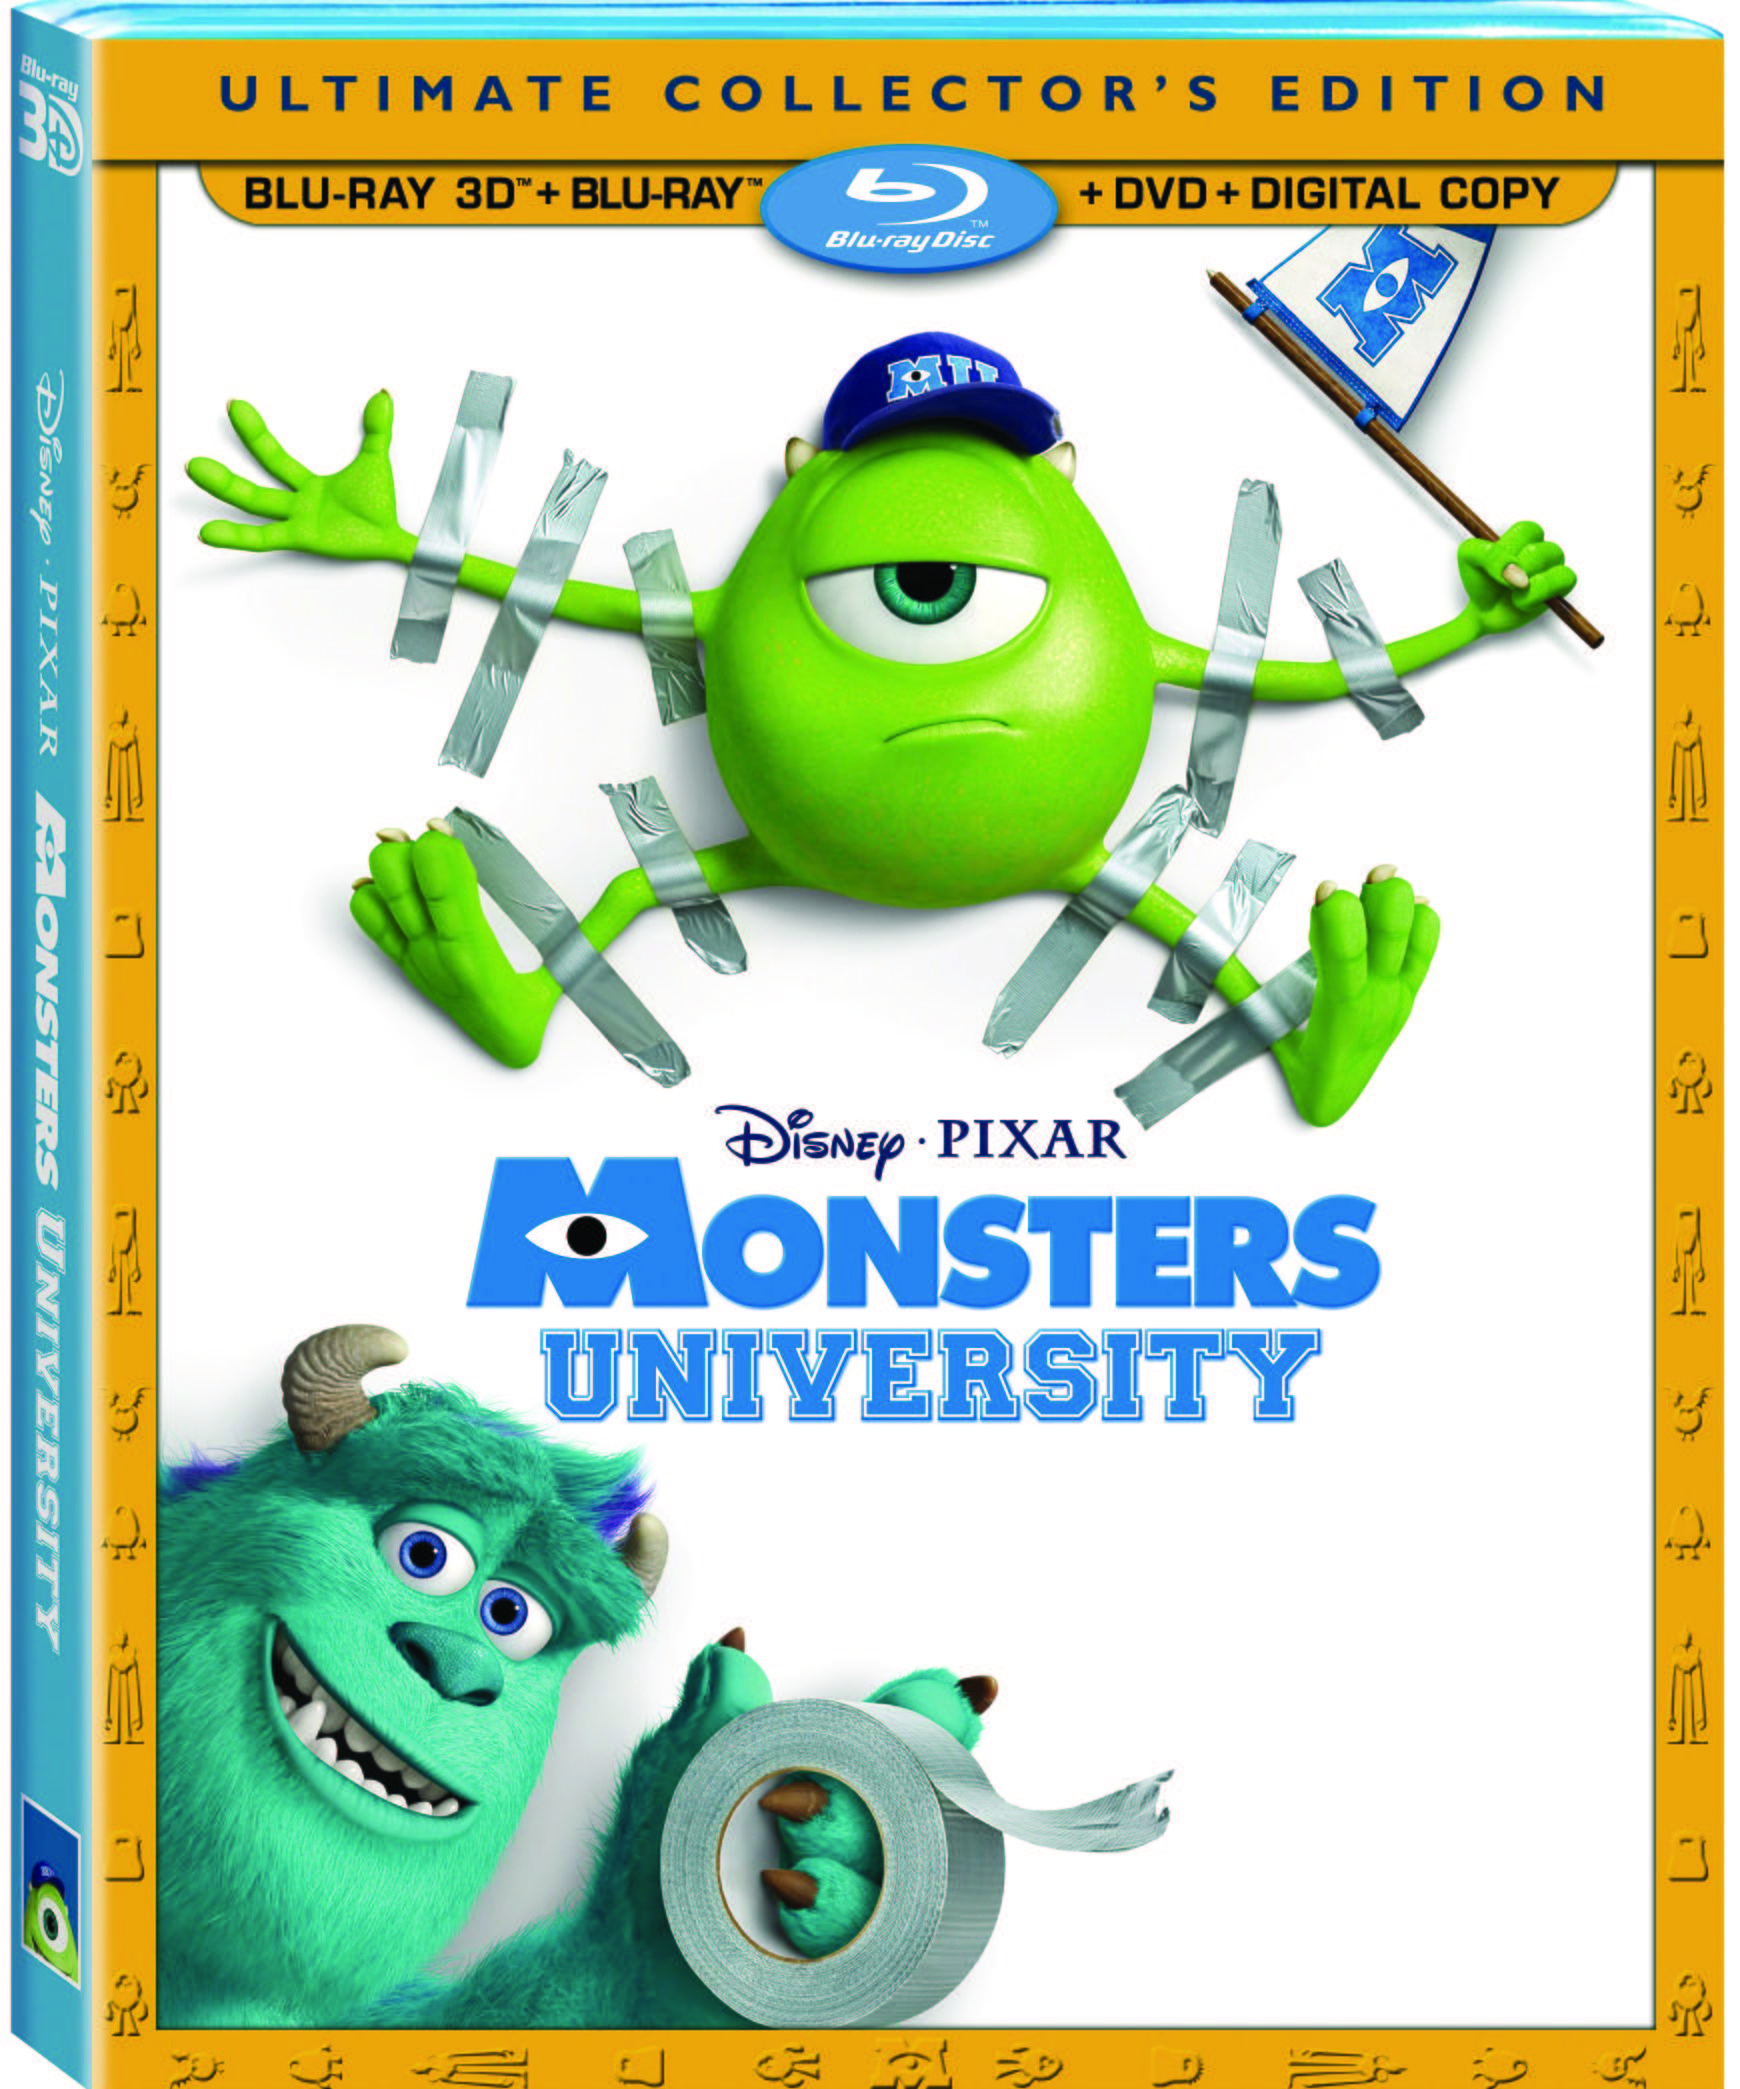 MonstersUniversity3DBlurayComboArt.jpg_cmyk